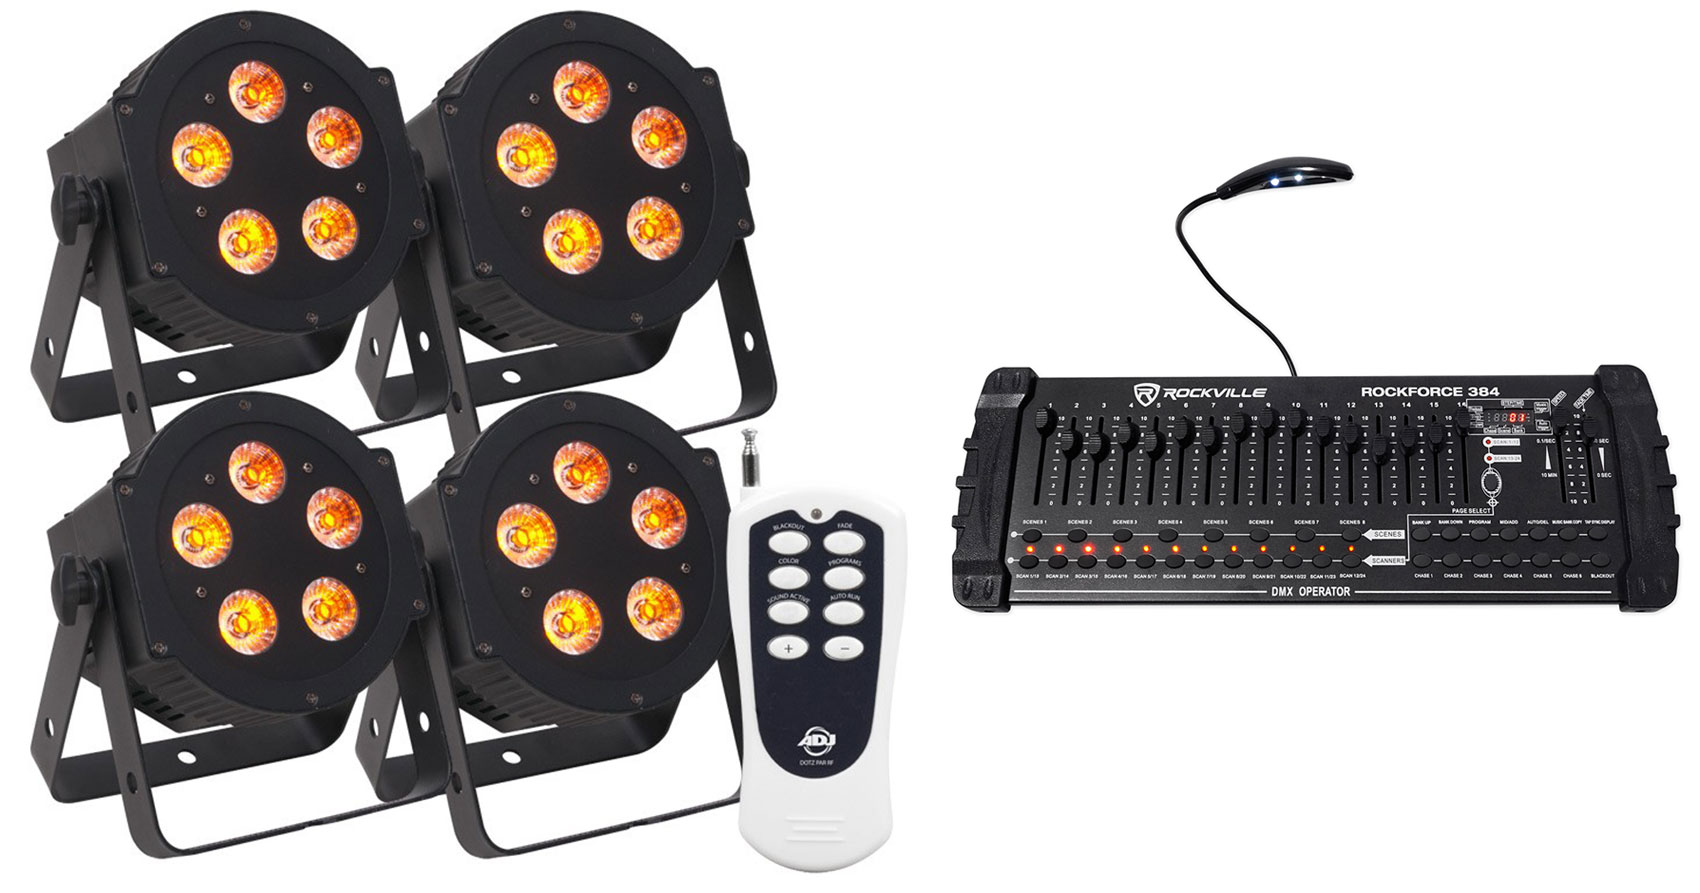 (4) American DJ ADJ 5P-HEX 6-In-1 RGBAW+UV LED Par Lights+Remote+DMX Controller by American DJ